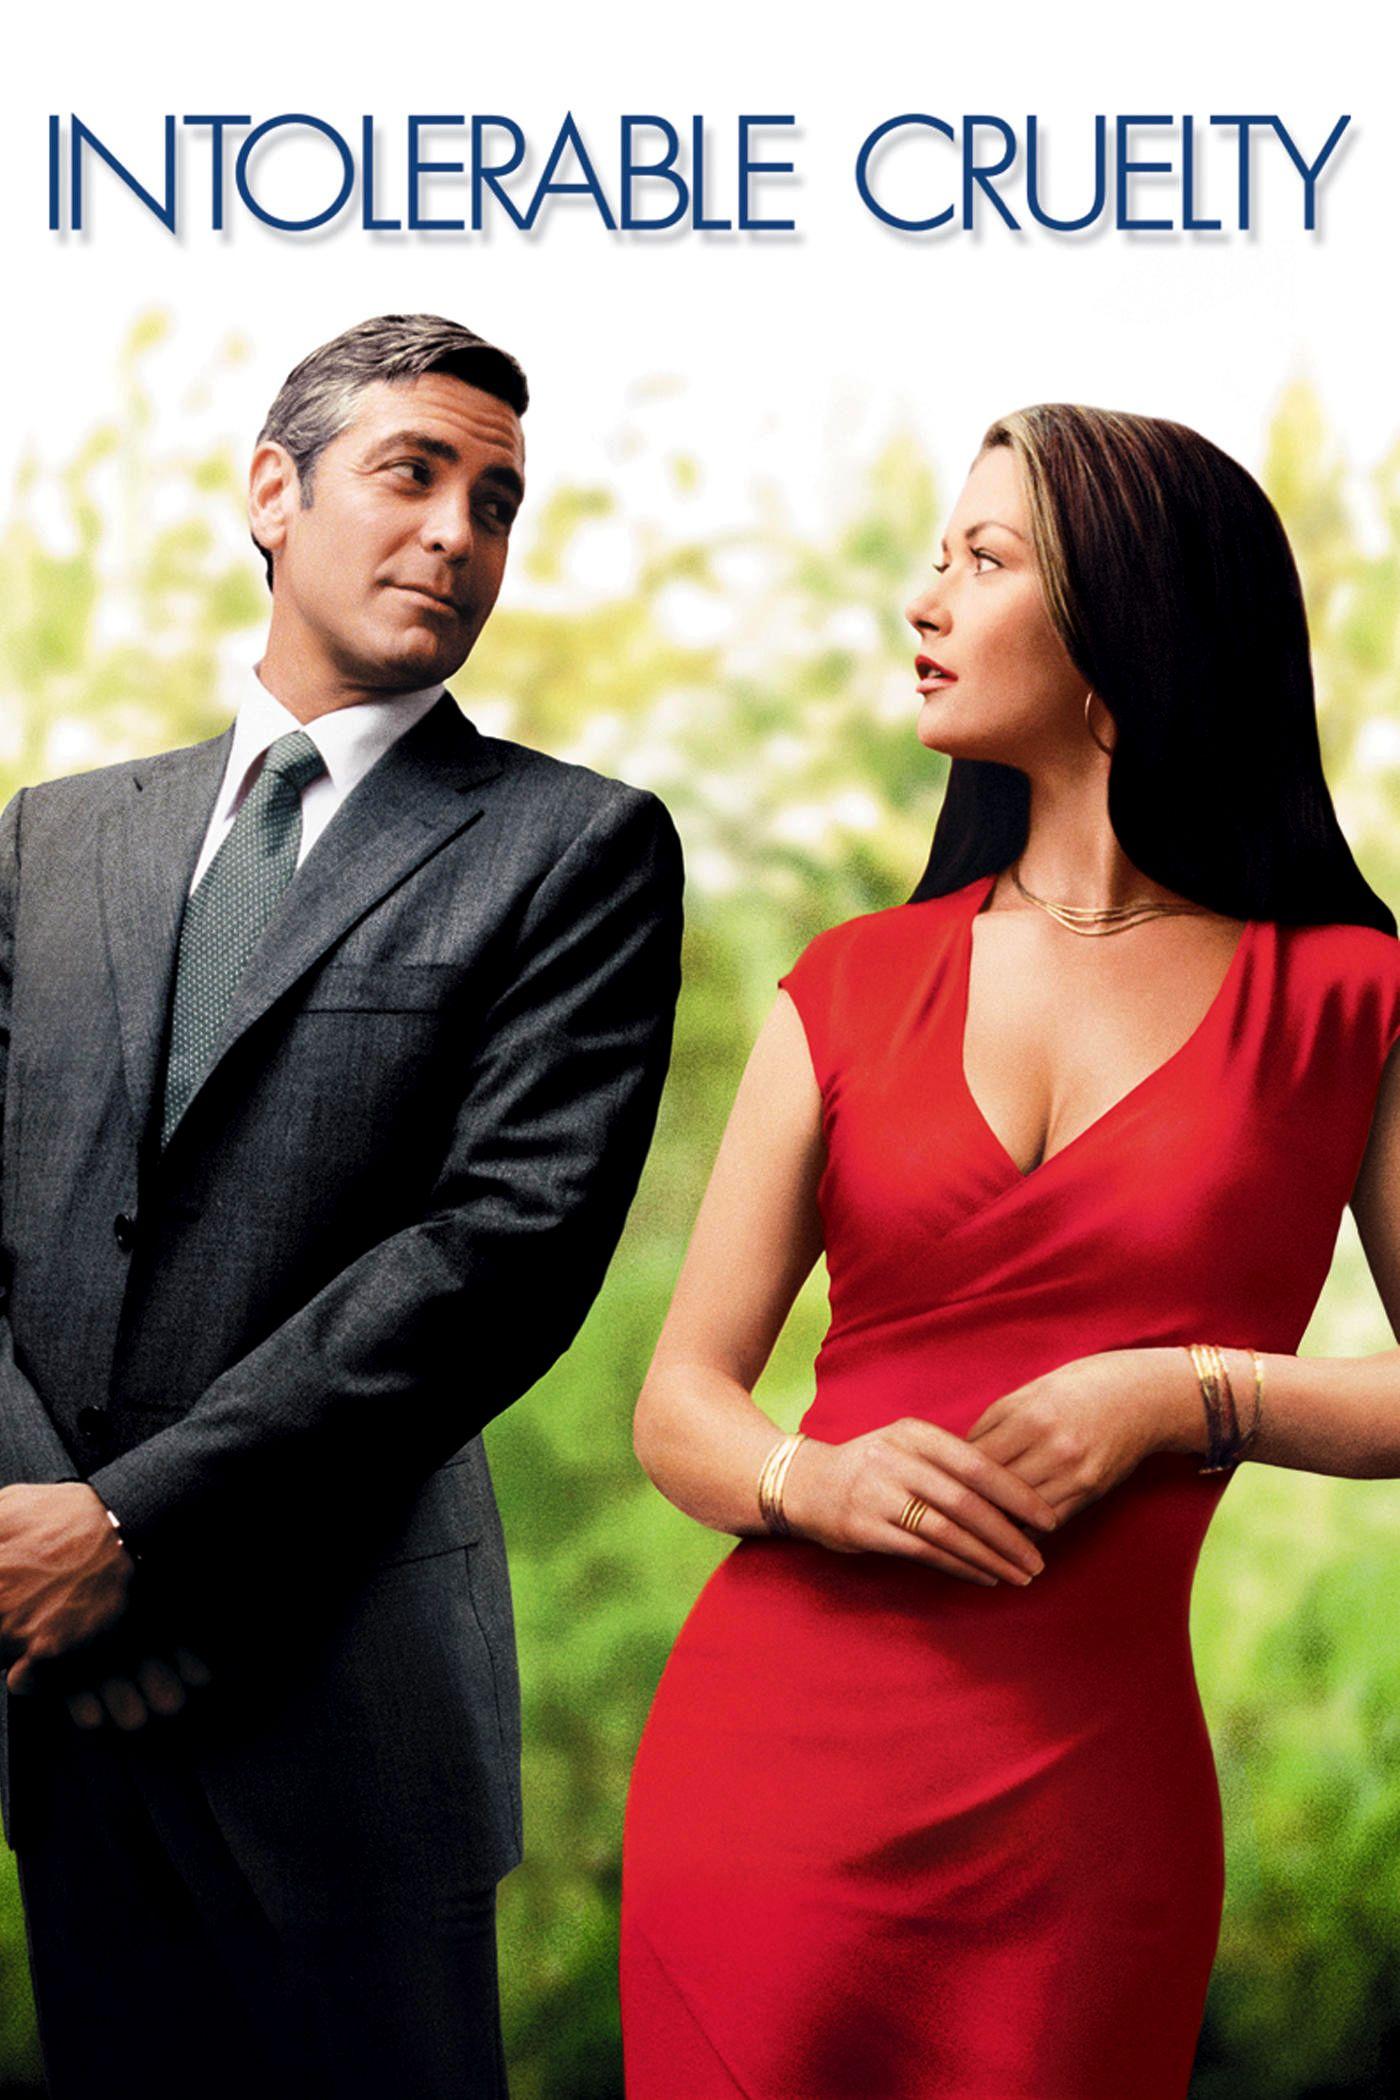 Intolerable Cruelty Movie Poster Http Ift Tt 2g7v0dr George Clooney Catherine Zeta Jones Cedric The Entertainer